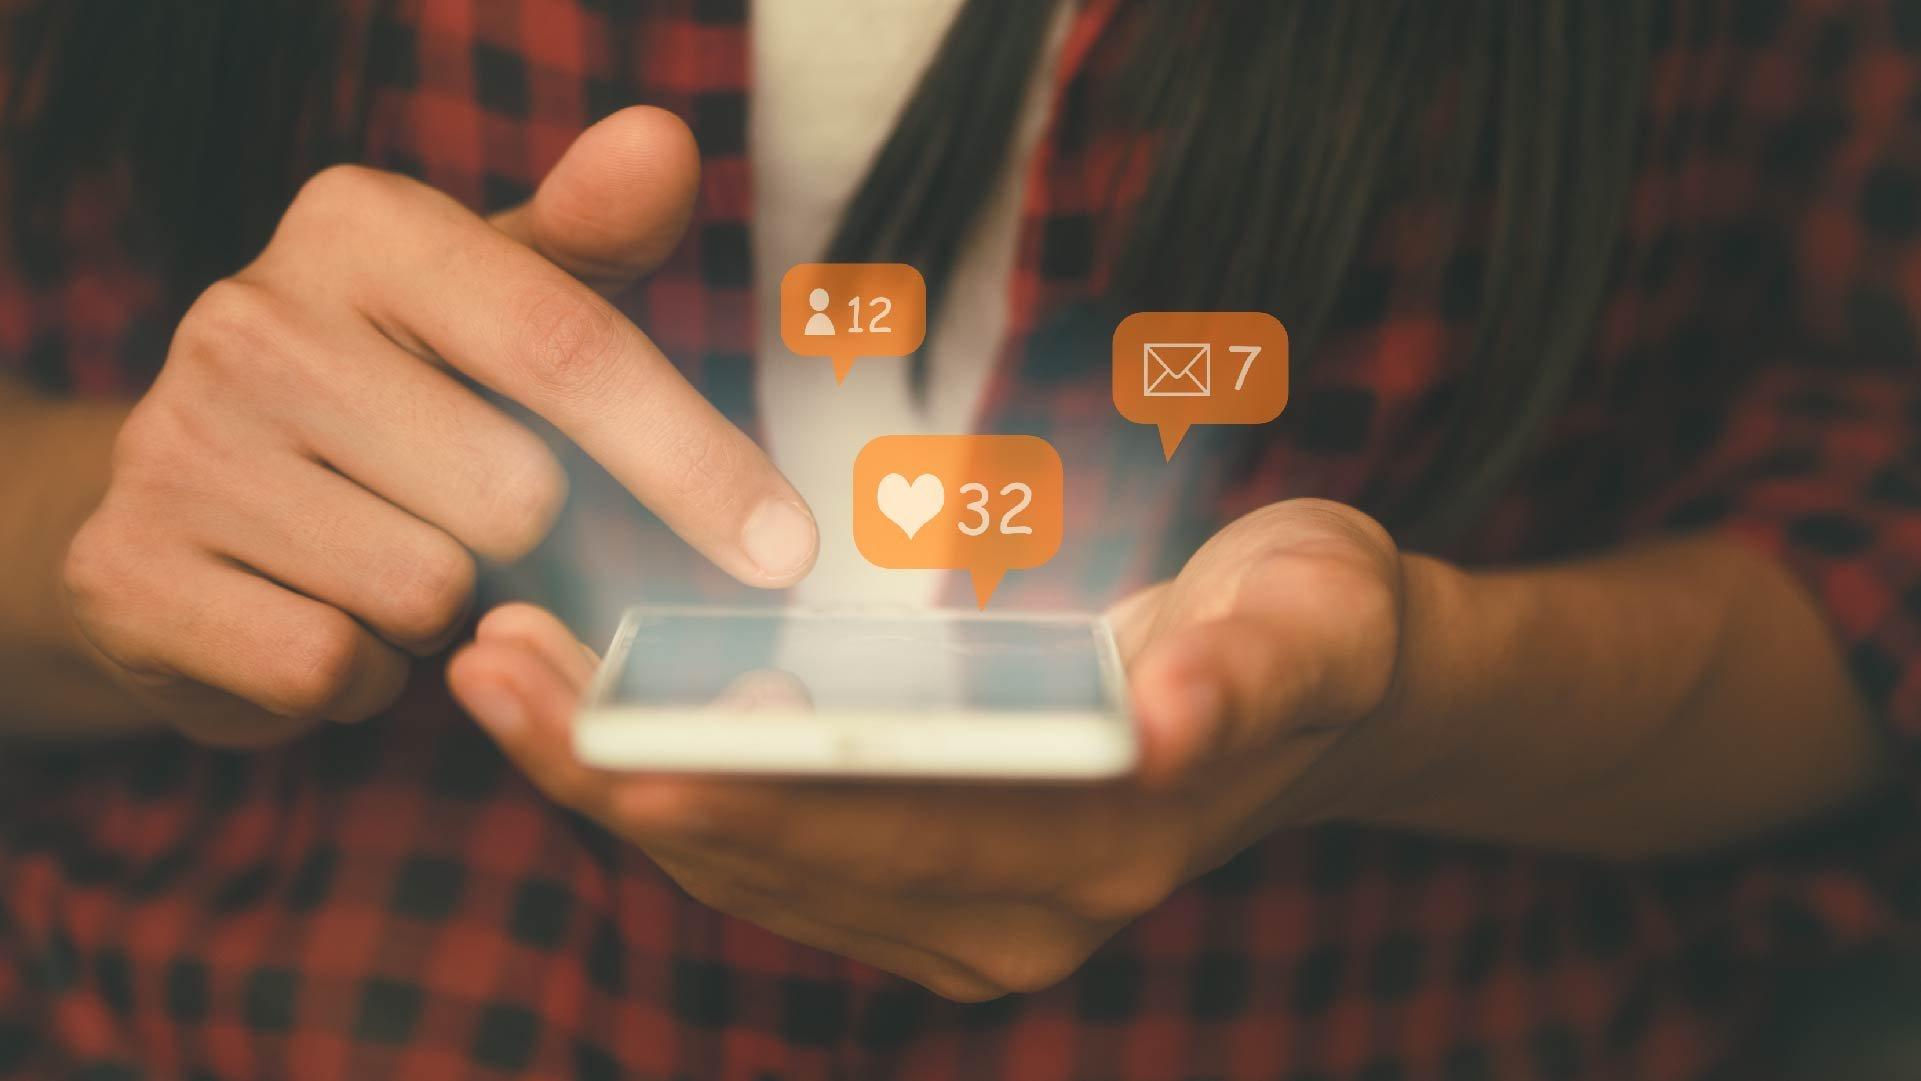 MS_Agency_Blog_8_Trends_in_Digital_Marketing_JAN_IMAGES_Thumbnail